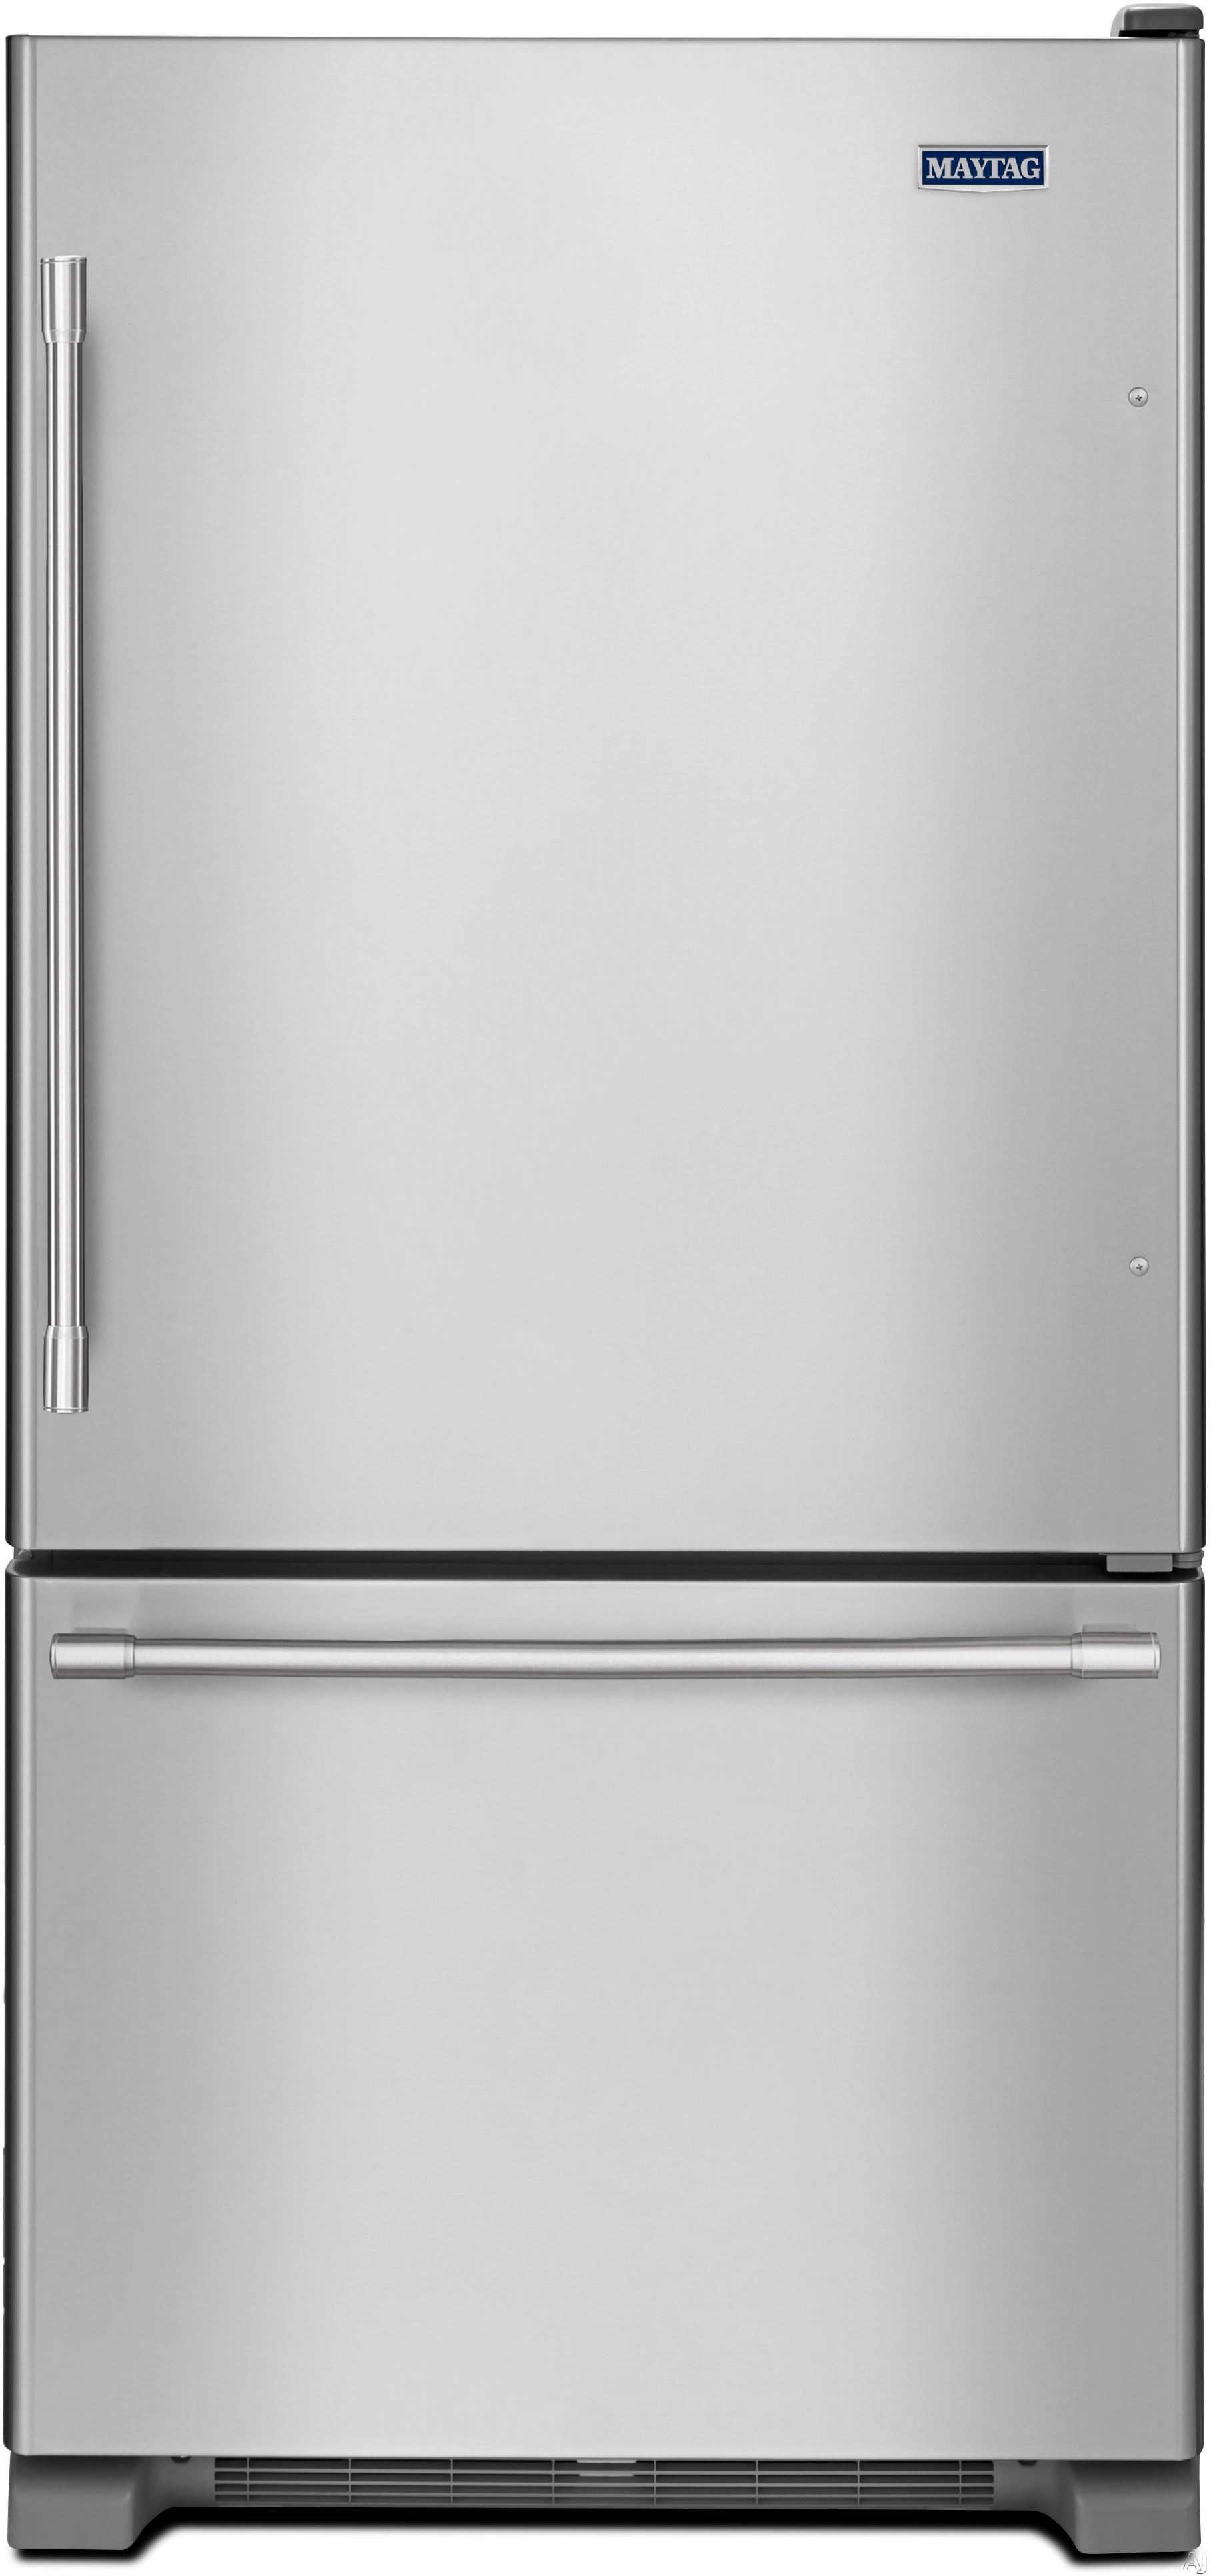 Maytag MBF1958FE 30 Inch Bottom-Freezer Refrigerator with 19.0 cu. ft. Capacity, Adjustable Spill Proof Glass Shelving, Gallon Door Storage, 2 FreshLock Crisper Drawers, Deli Drawer, BrightSeries LED Lighting and ENERGY STAR